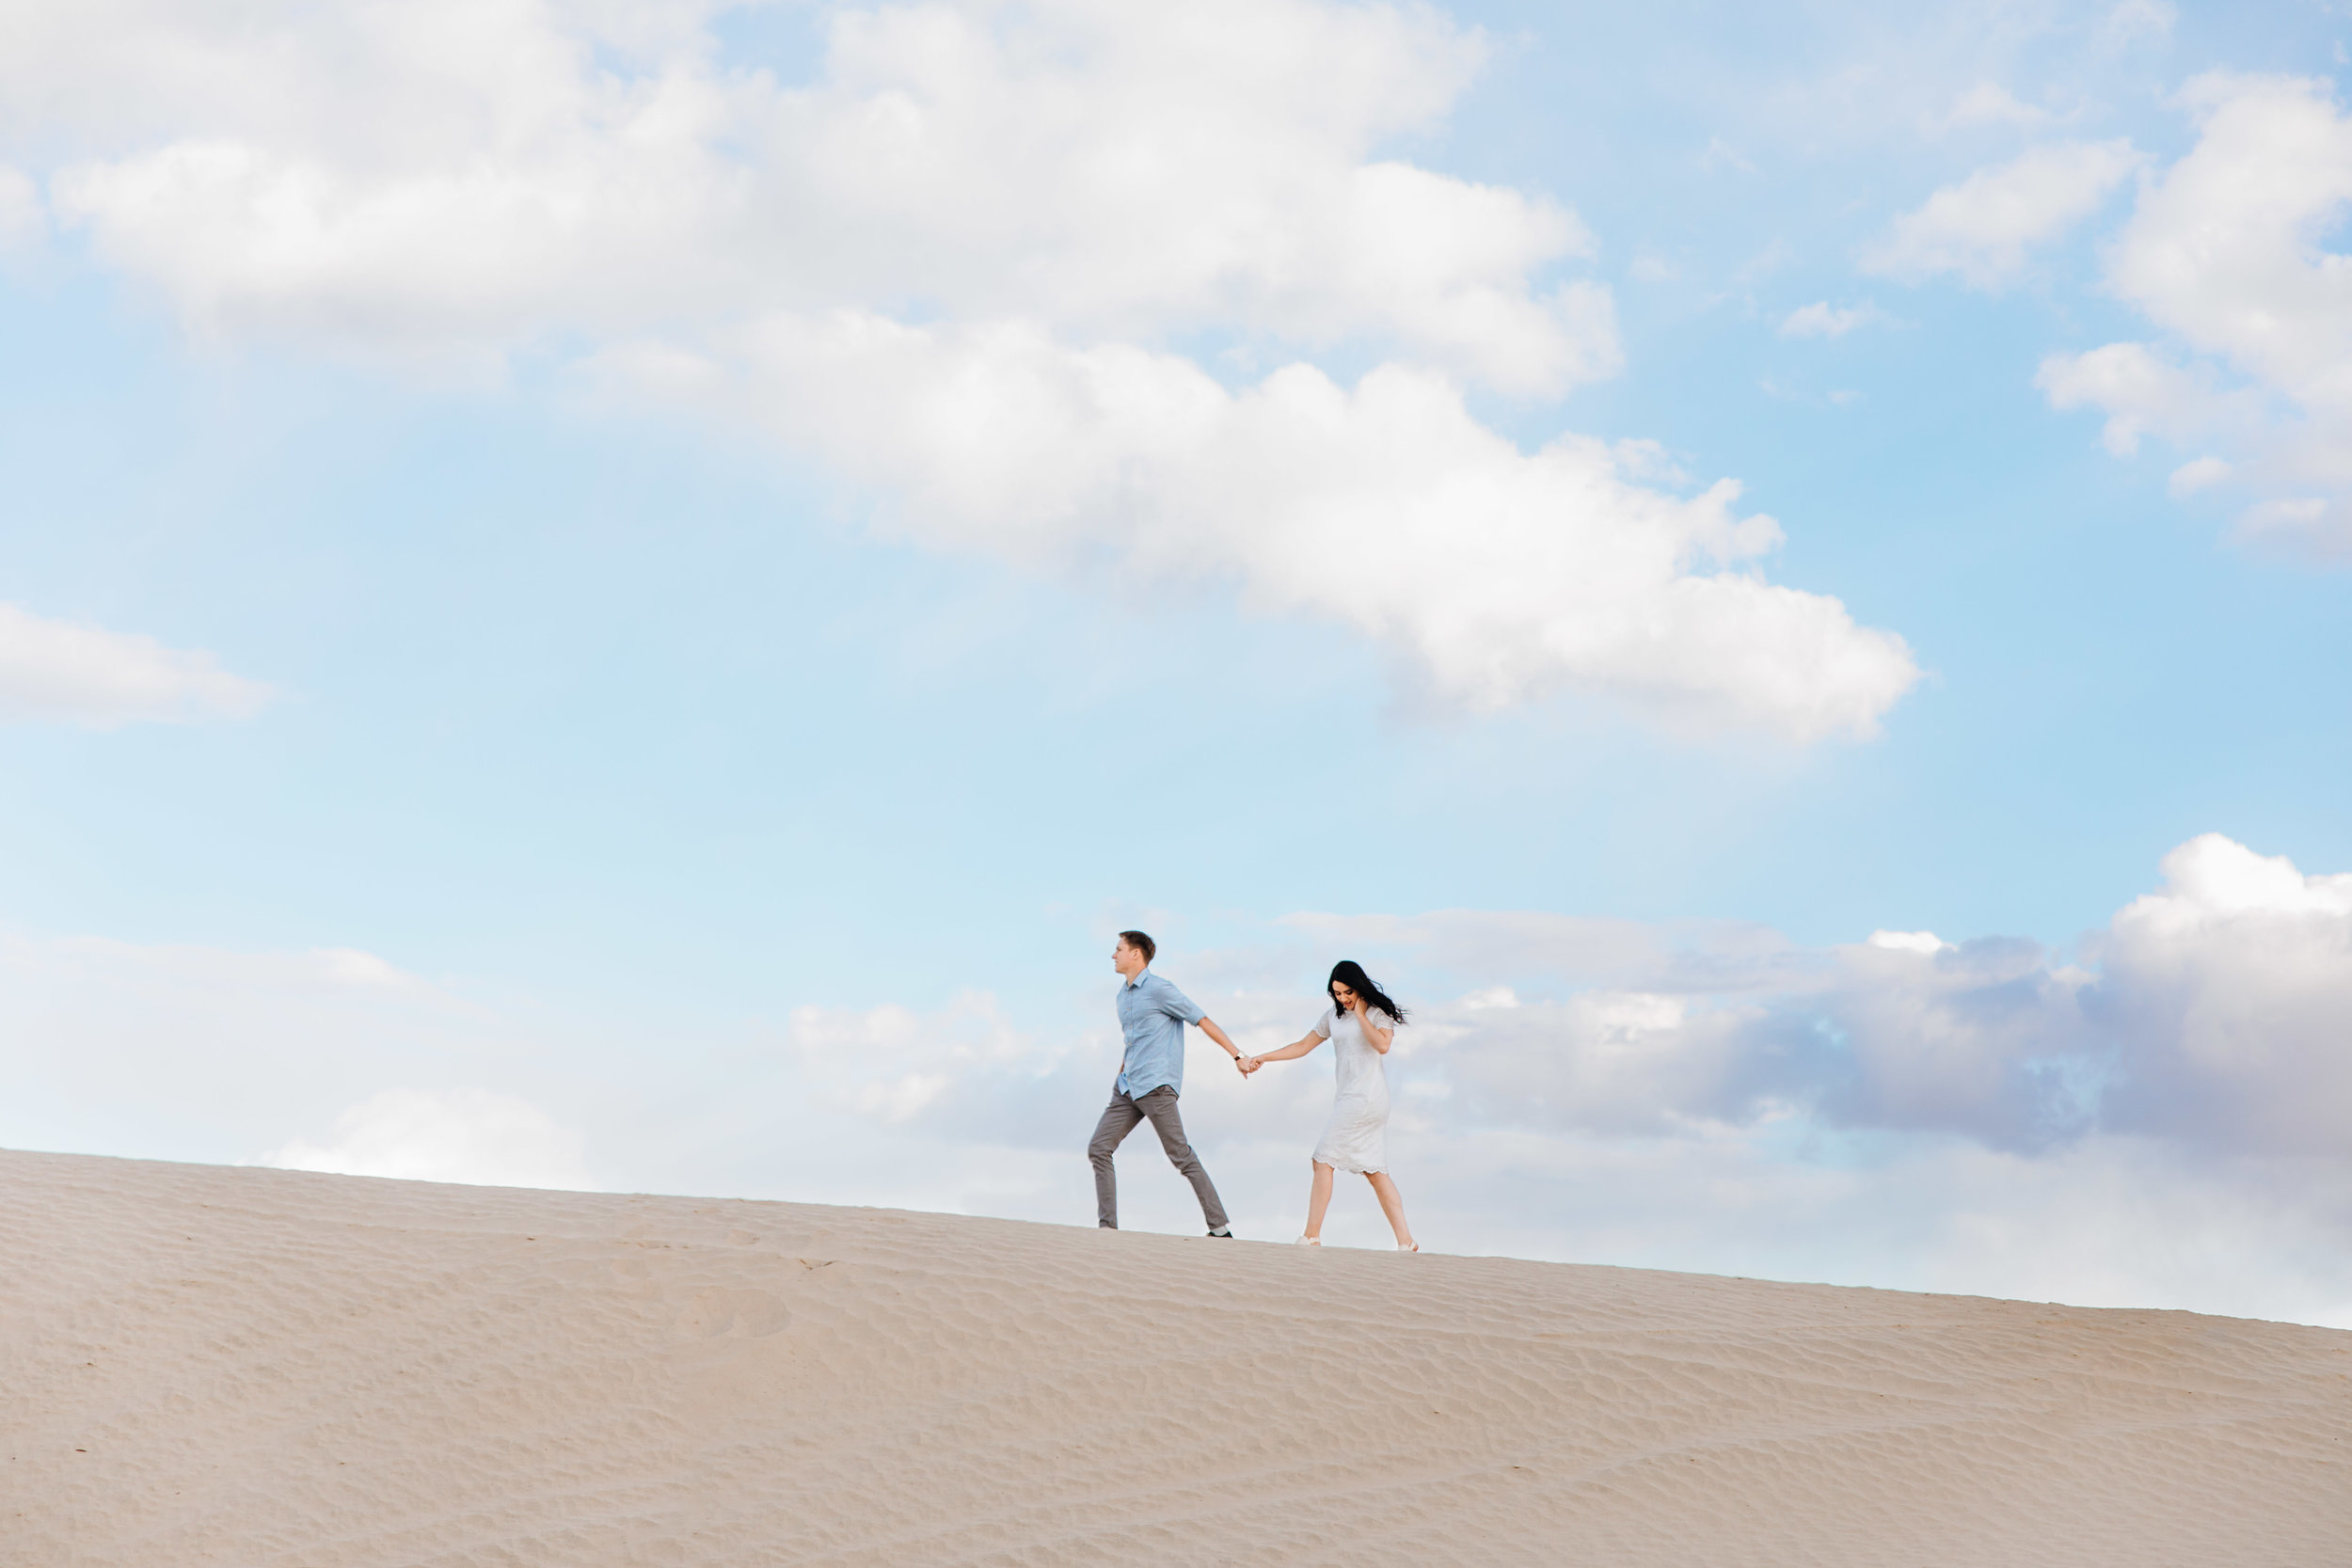 little-sahara-recreation-area-elopement-engagement-wedding-photography-michael-cozzens-7.jpg